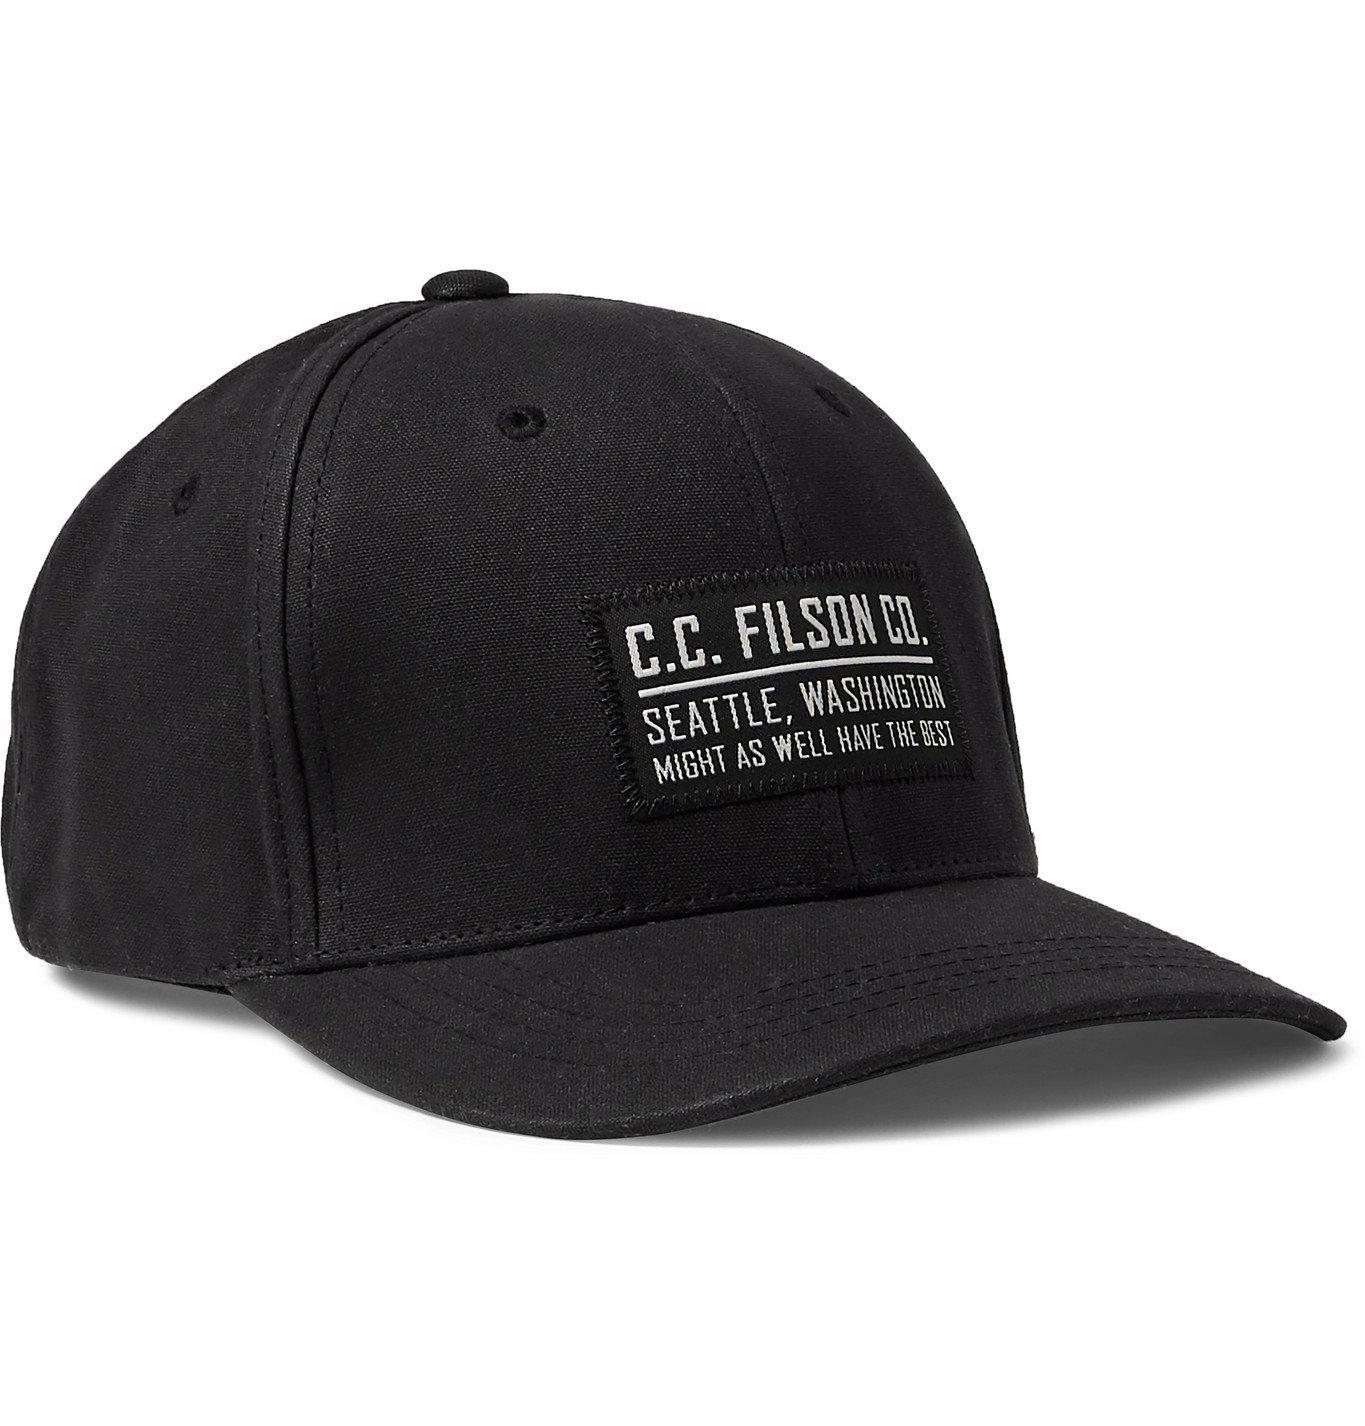 Filson - Logger Appliquéd Waxed-Cotton Baseball Cap - Black